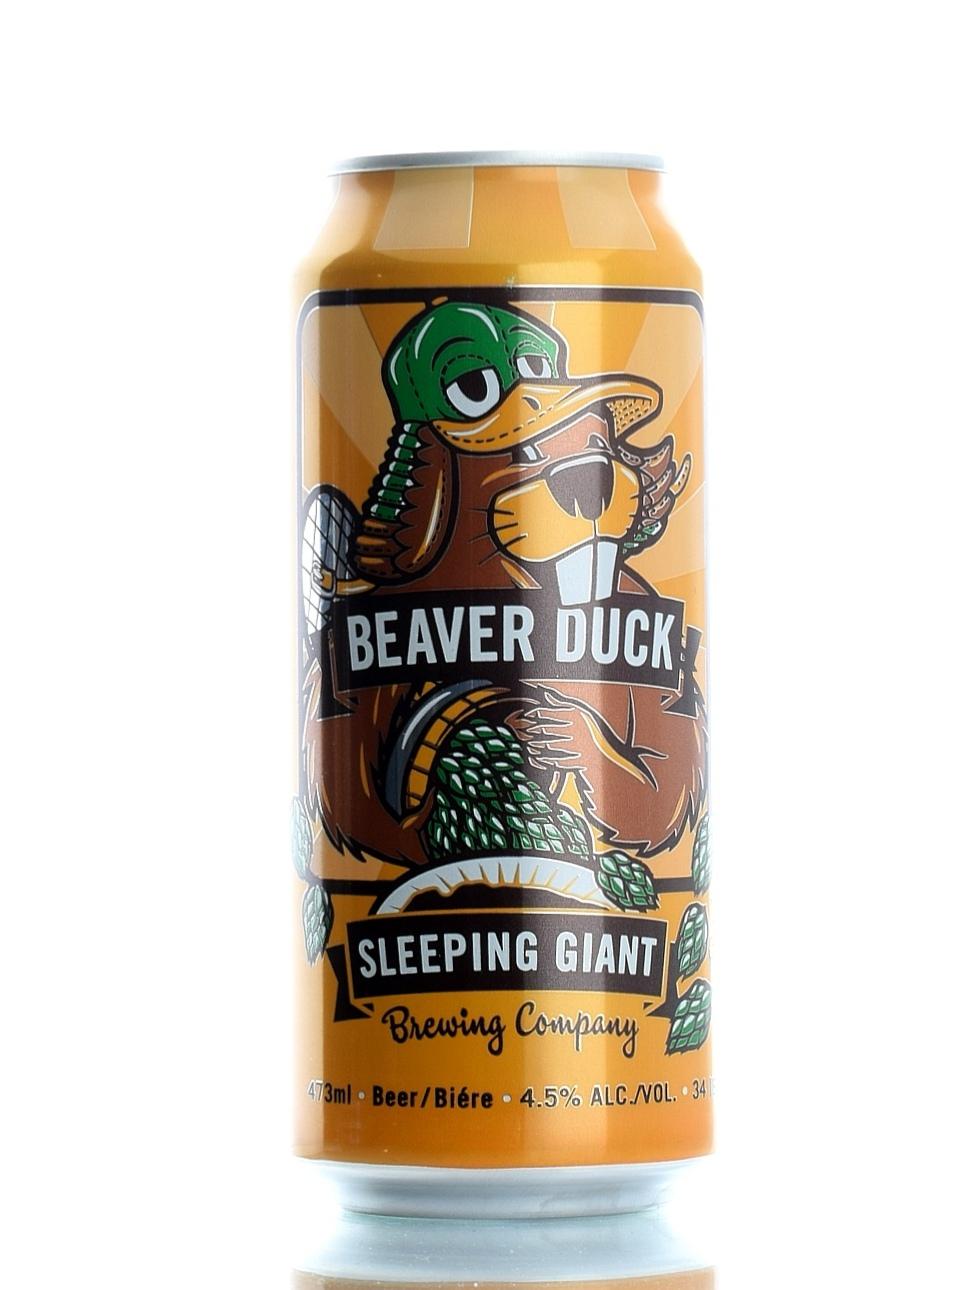 Sleeping Giant Brewing Company